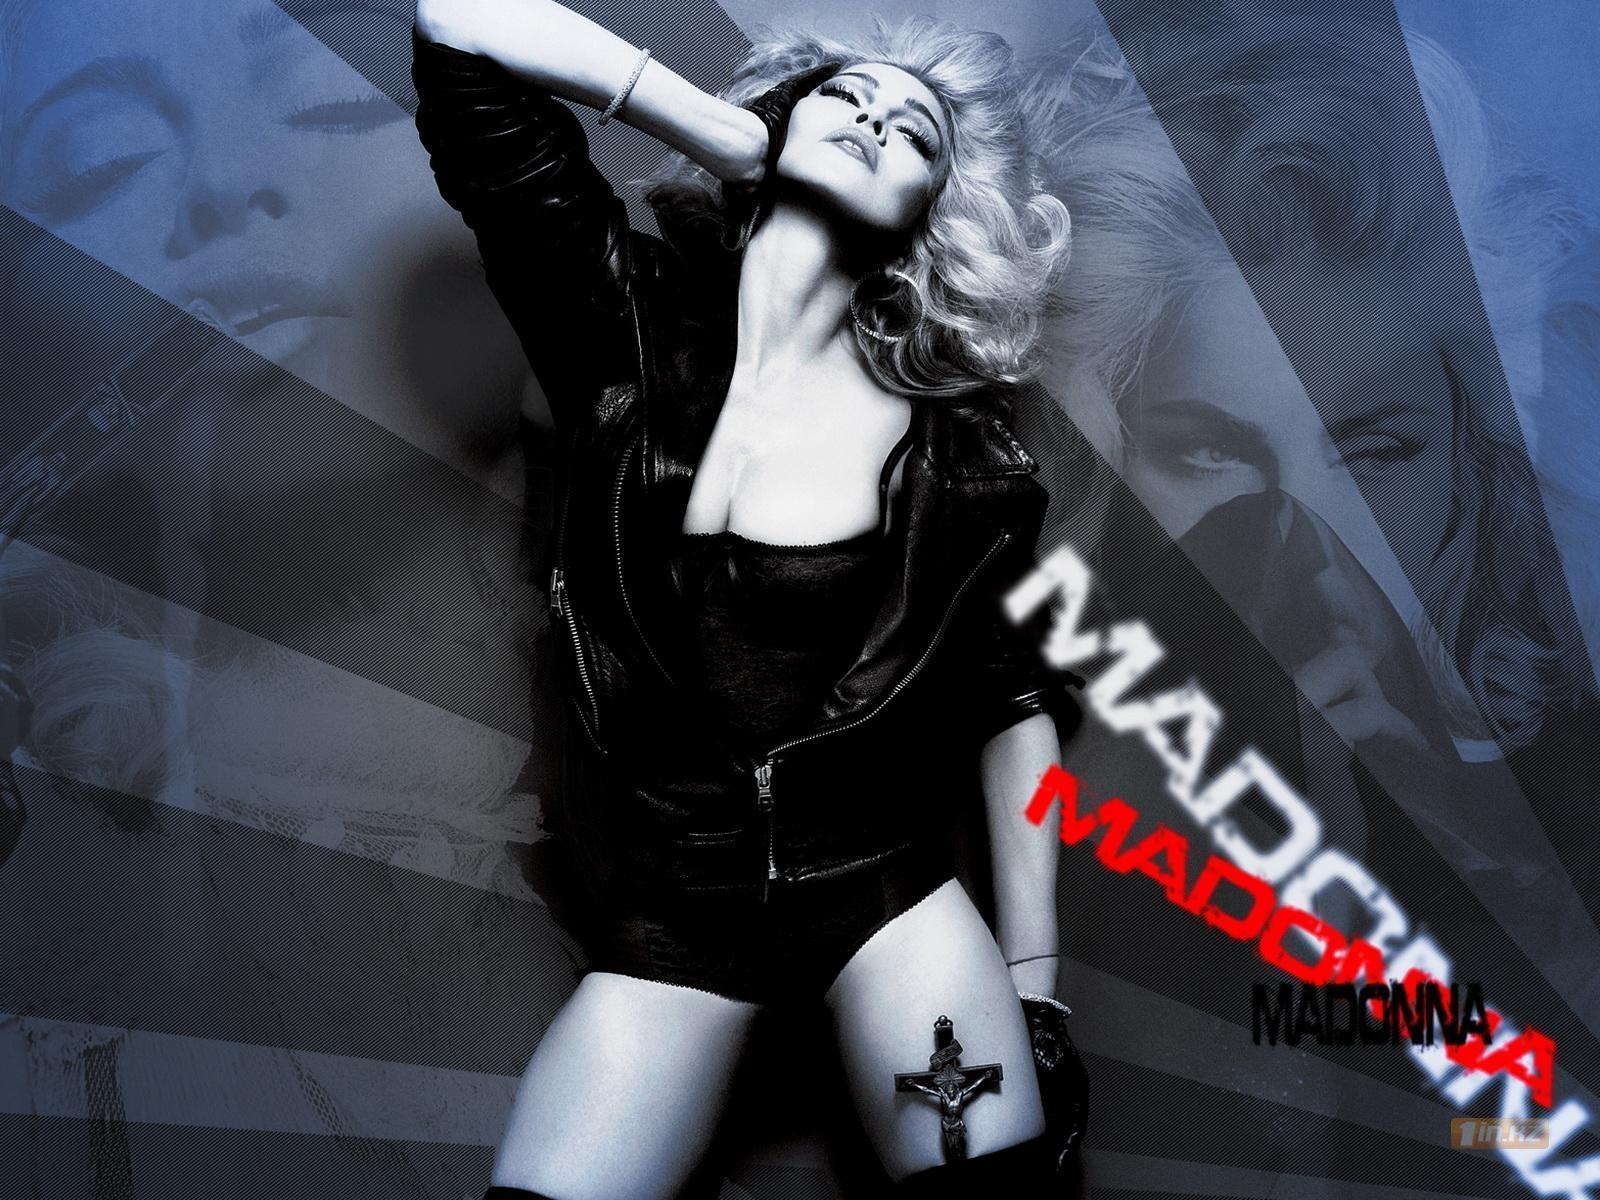 Madonna - Music (DJ Maxx Play 2015 Remix)